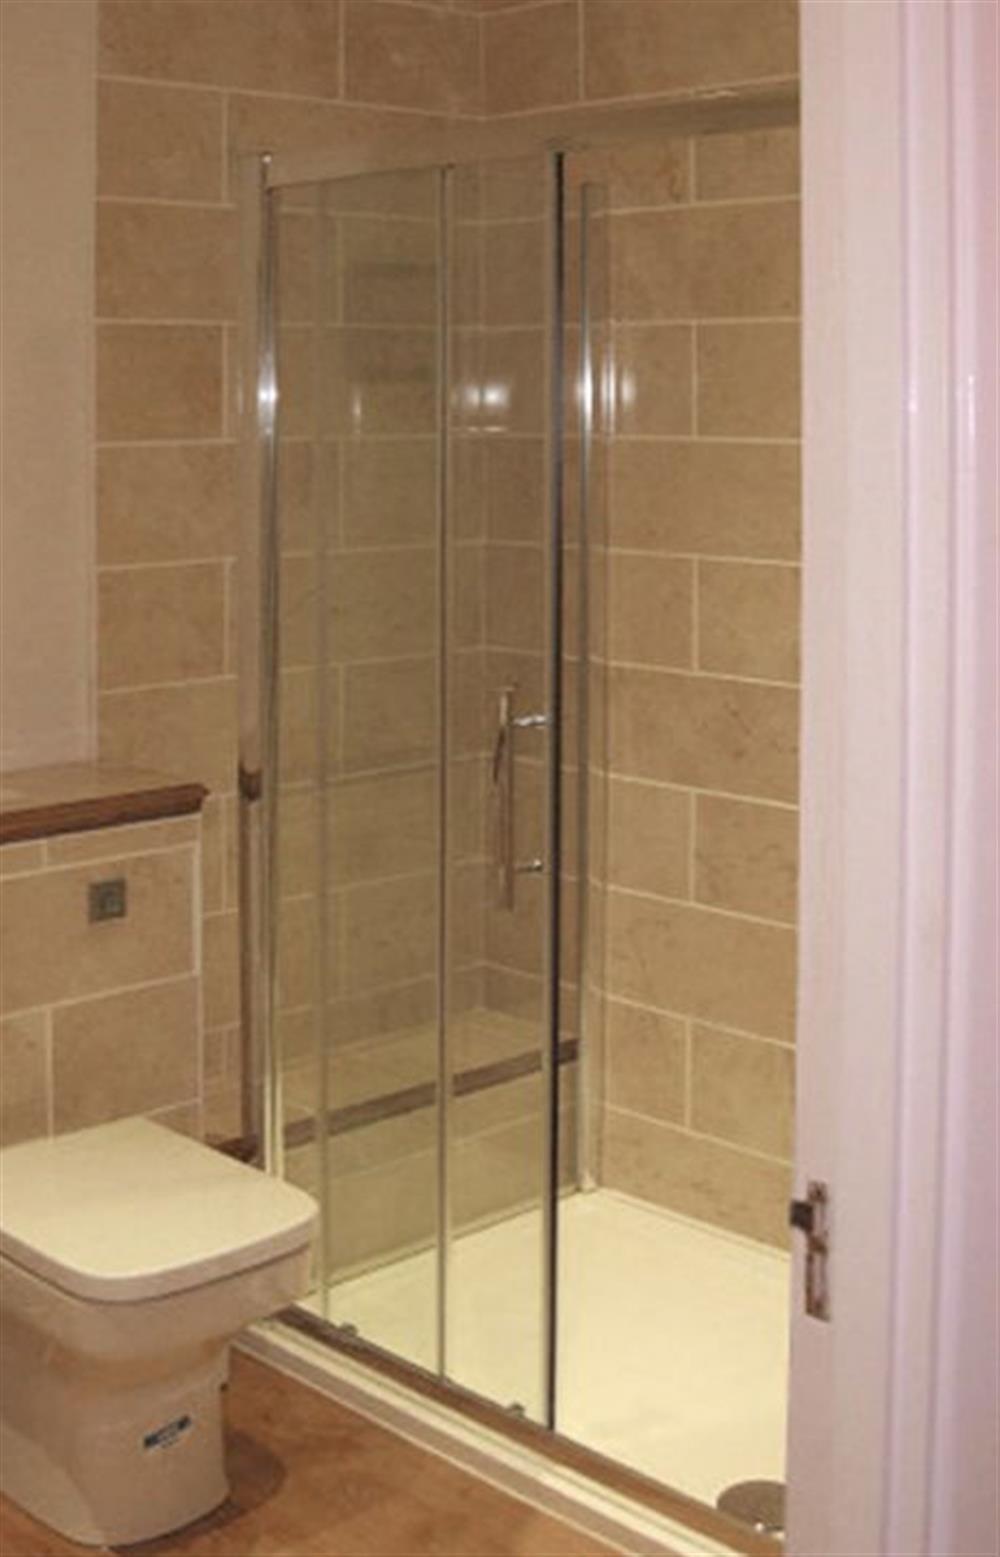 Bathroom at Bows, Dittisham, South Hams